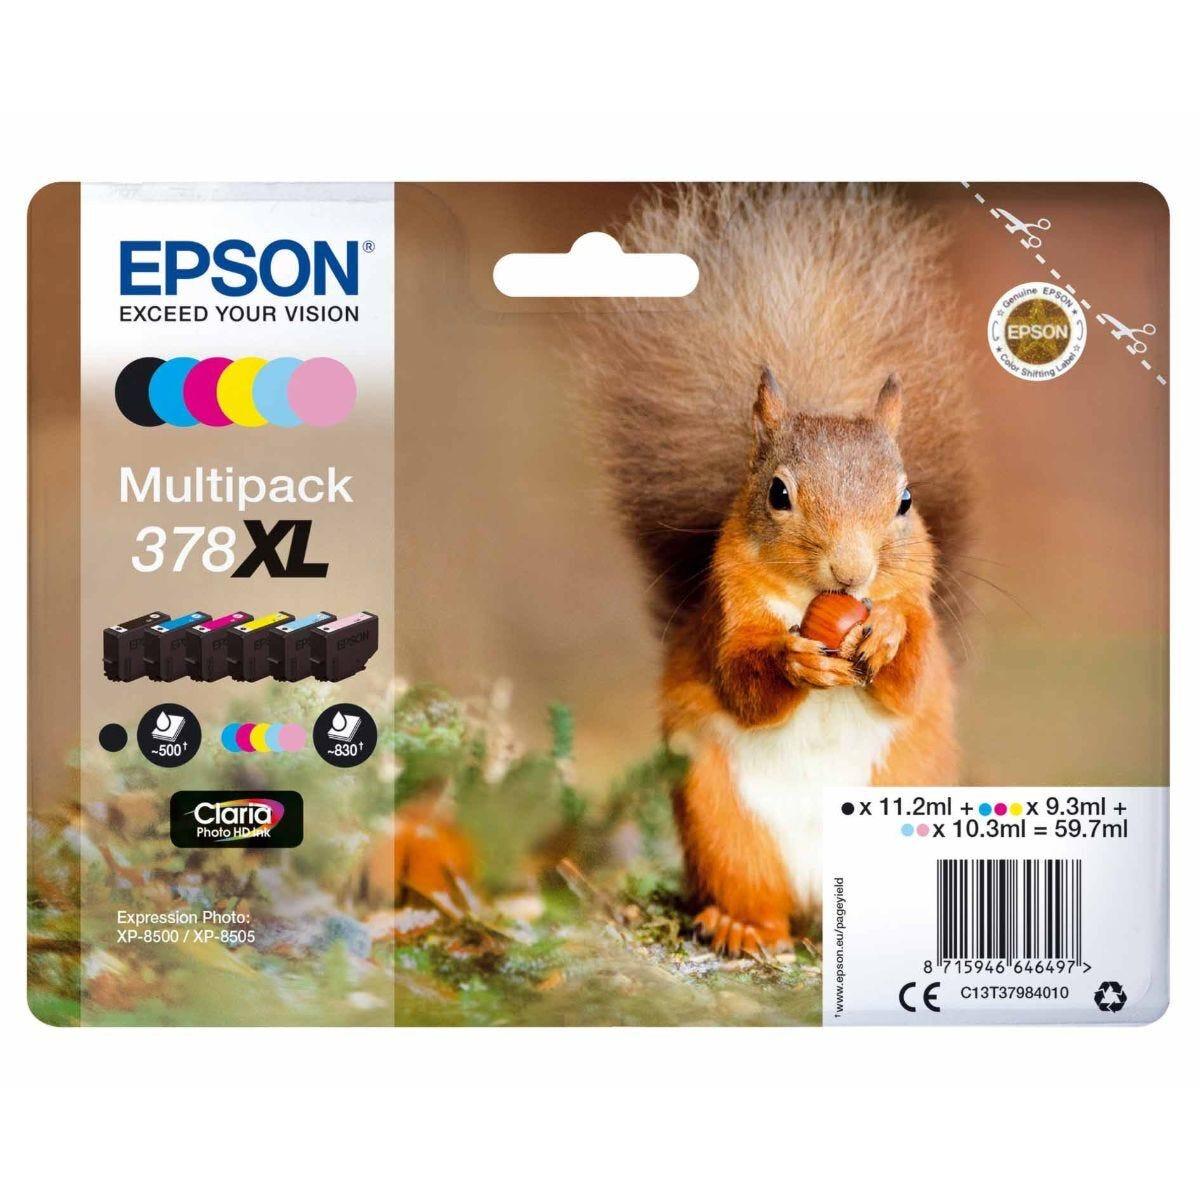 Epson 378XL Squirrel Ink Cartridge Multipack